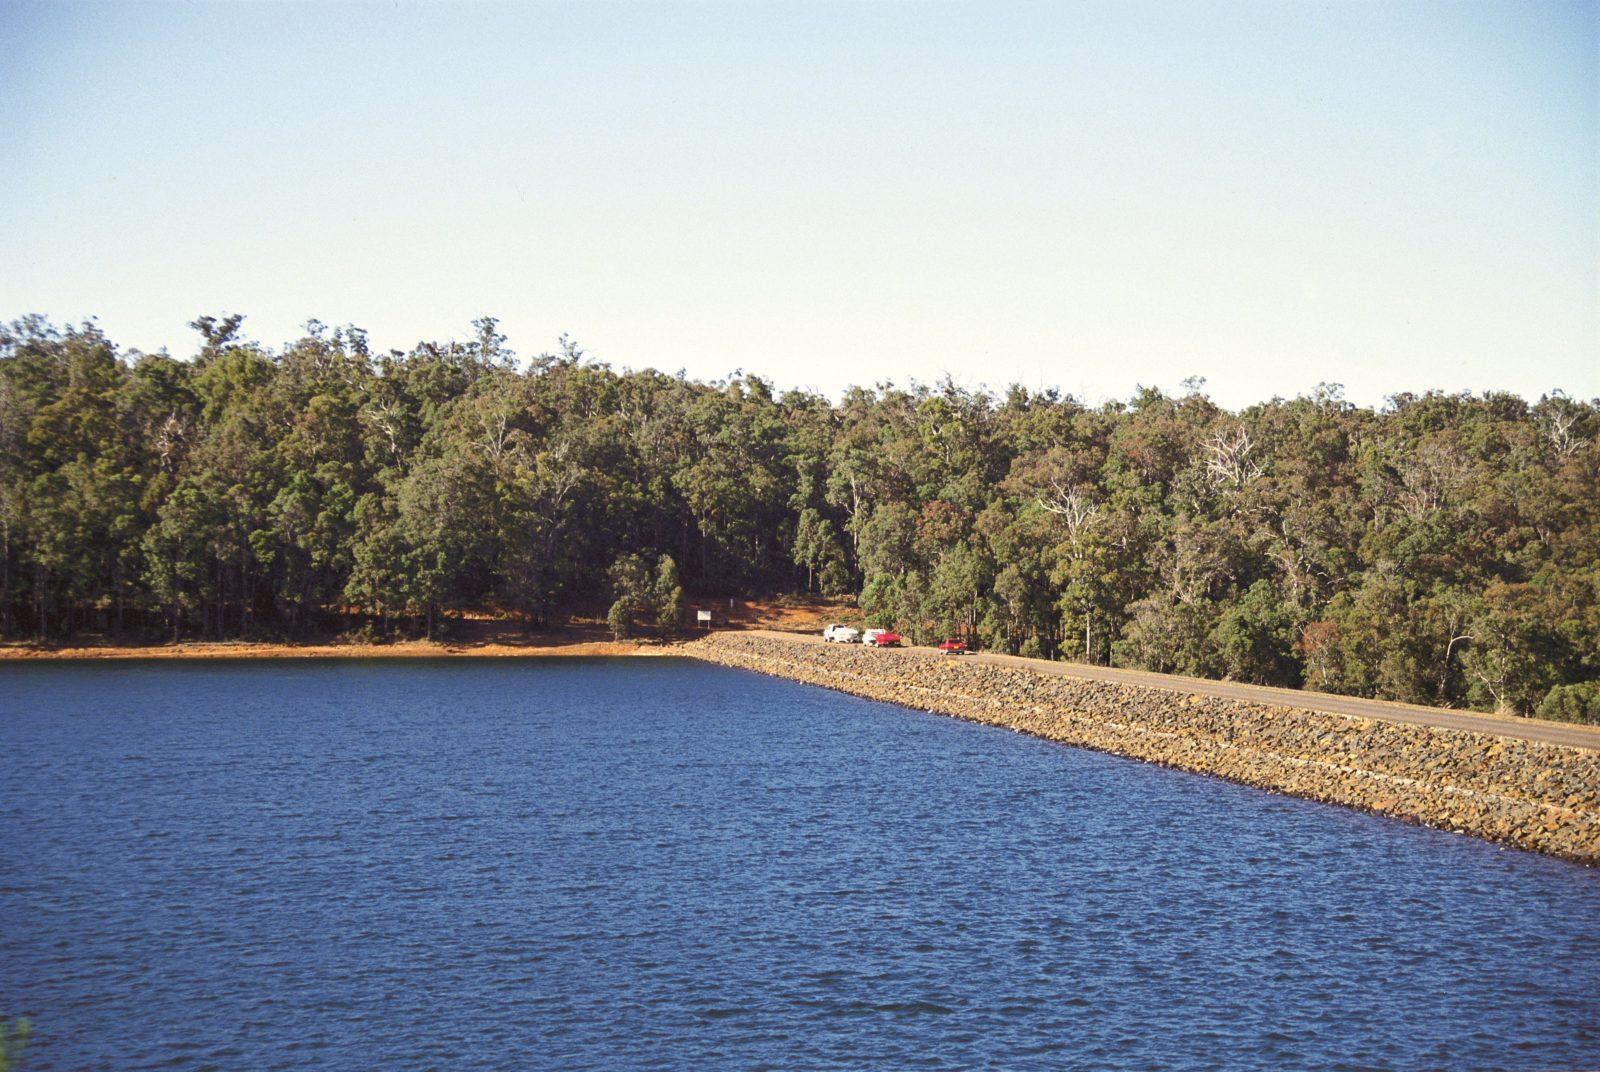 Waroona Dam, Waroona, Western Australia